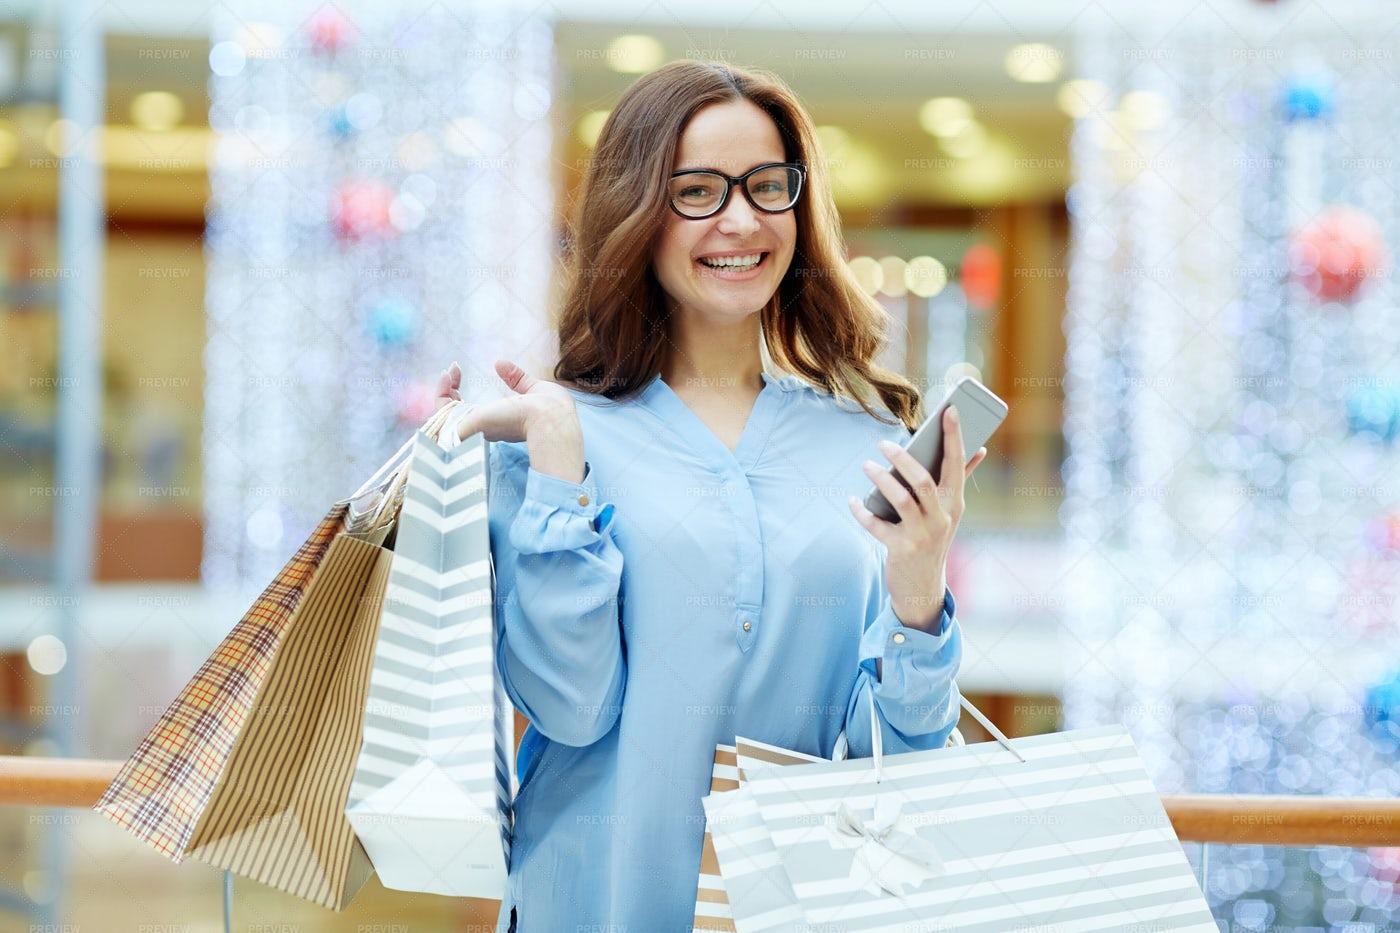 Consumer Laughing: Stock Photos